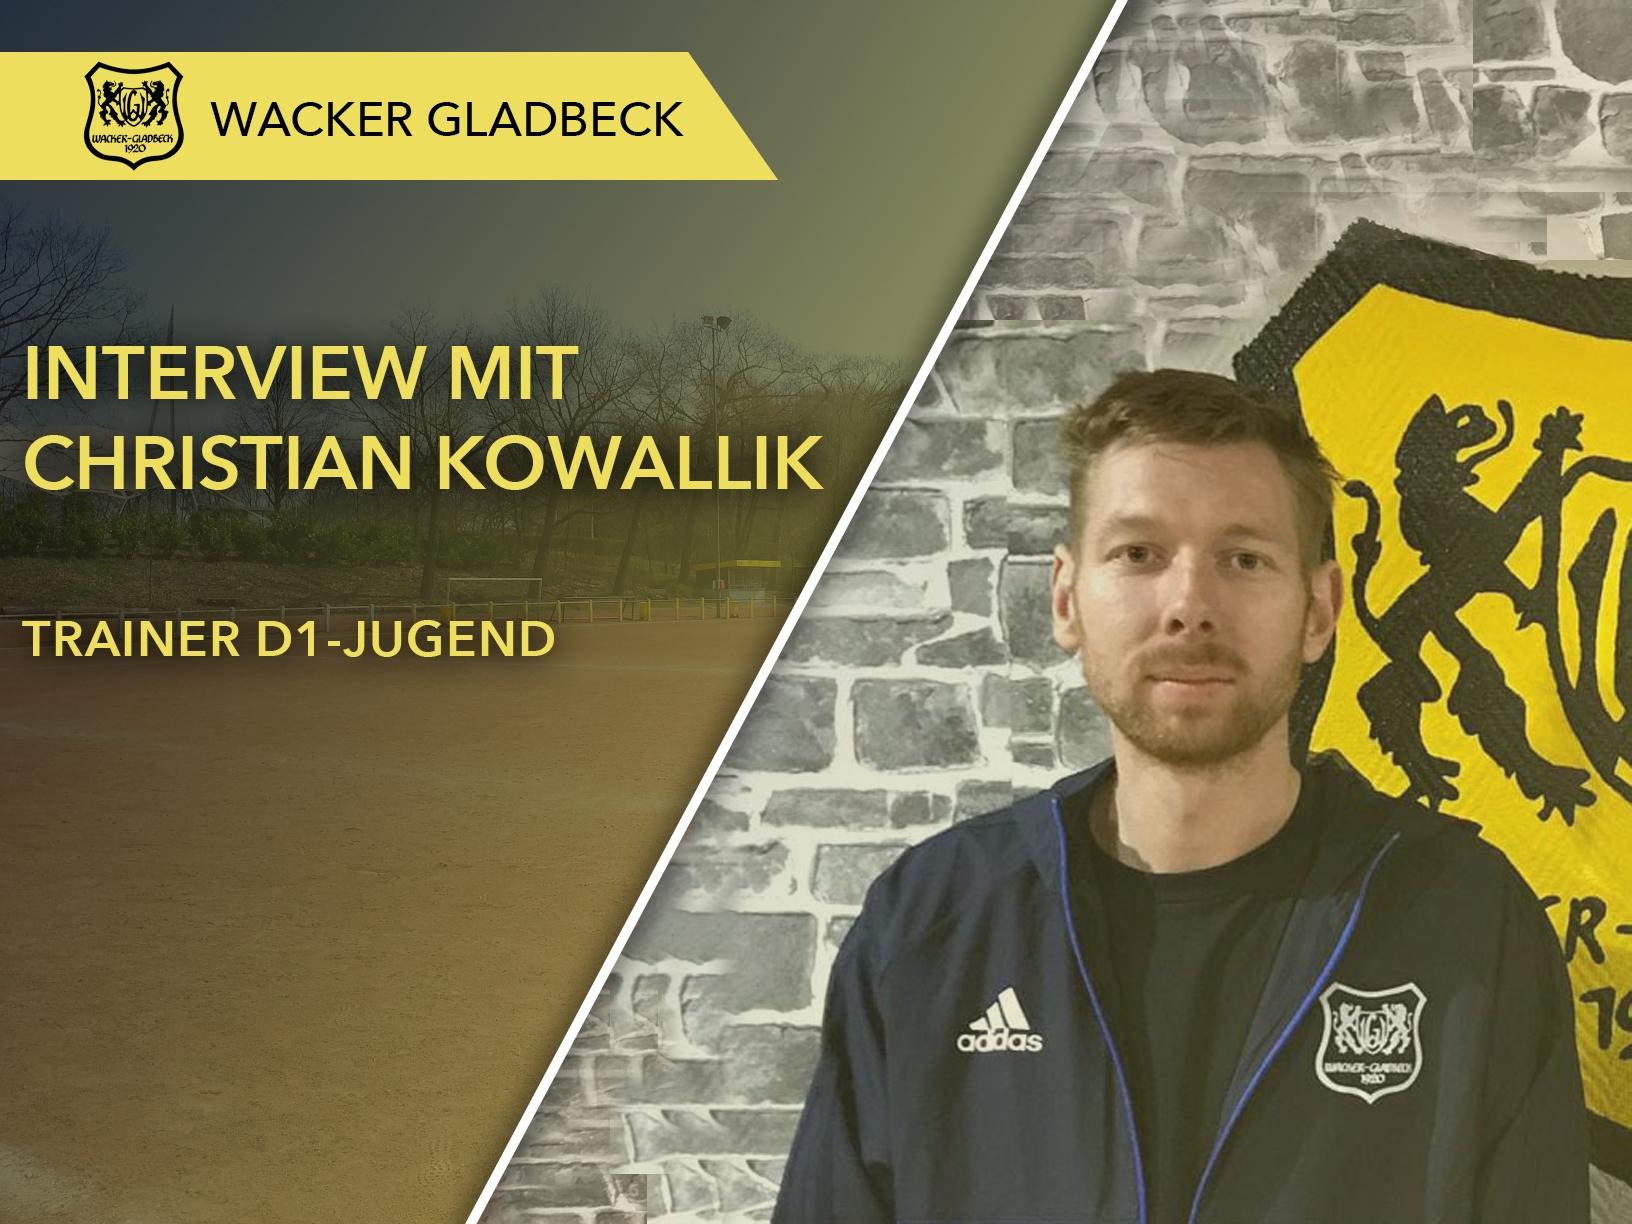 Wacker Gladbeck - Interview mit Jugendtrainer Christian Kowallik